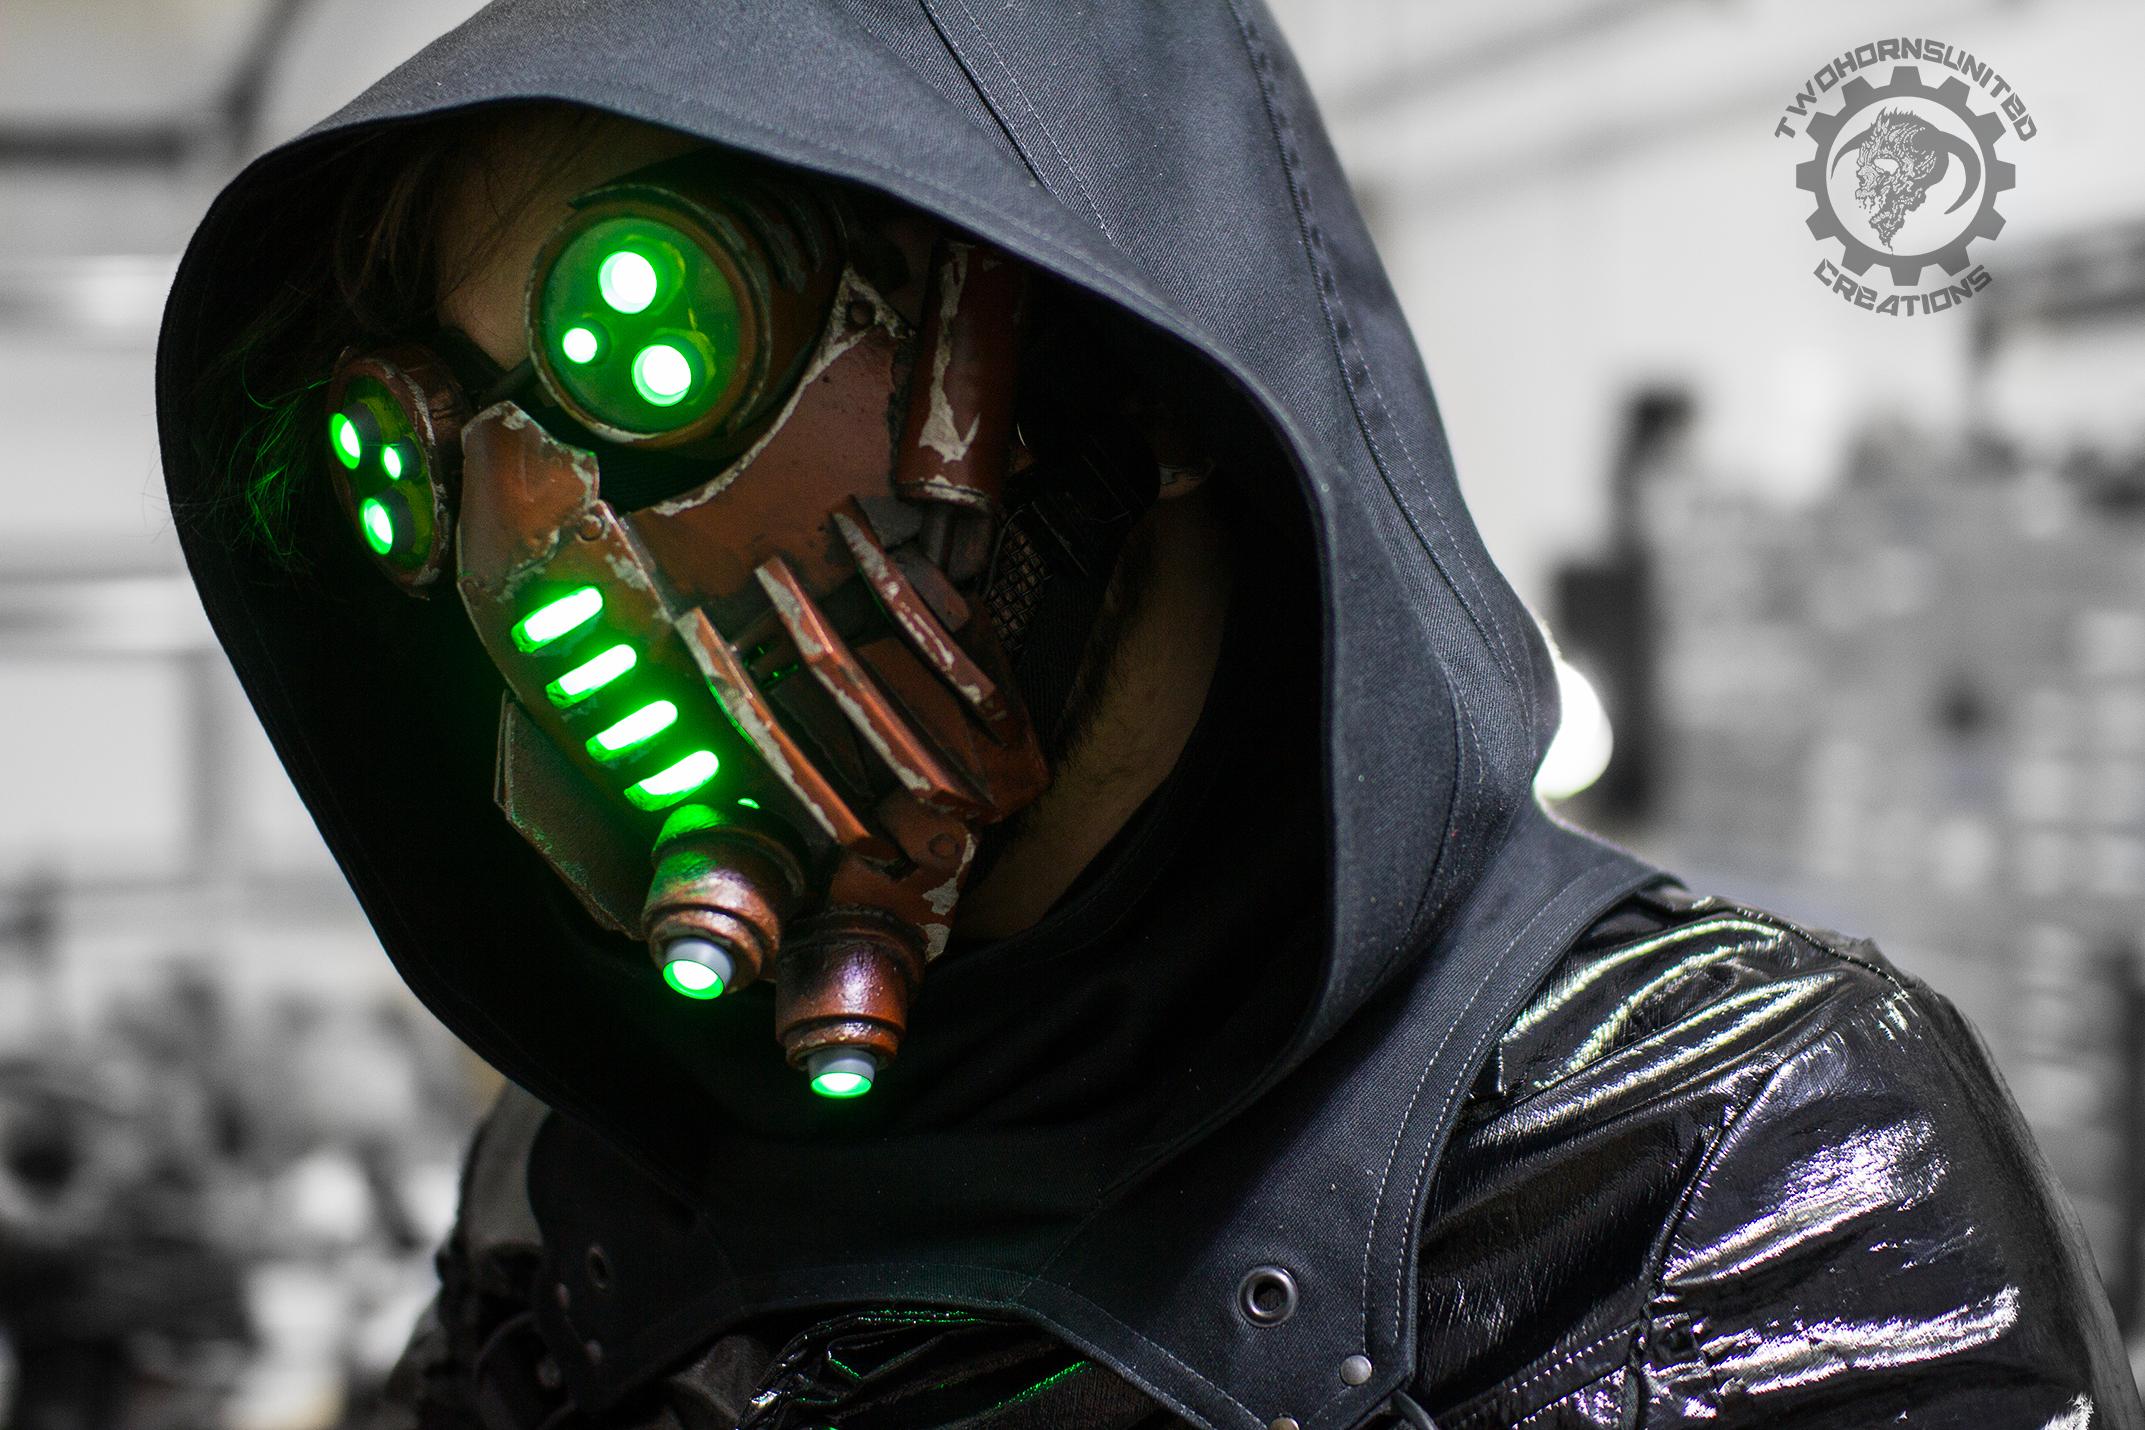 The Petrifier - Demon tech cyberpunk LED mask